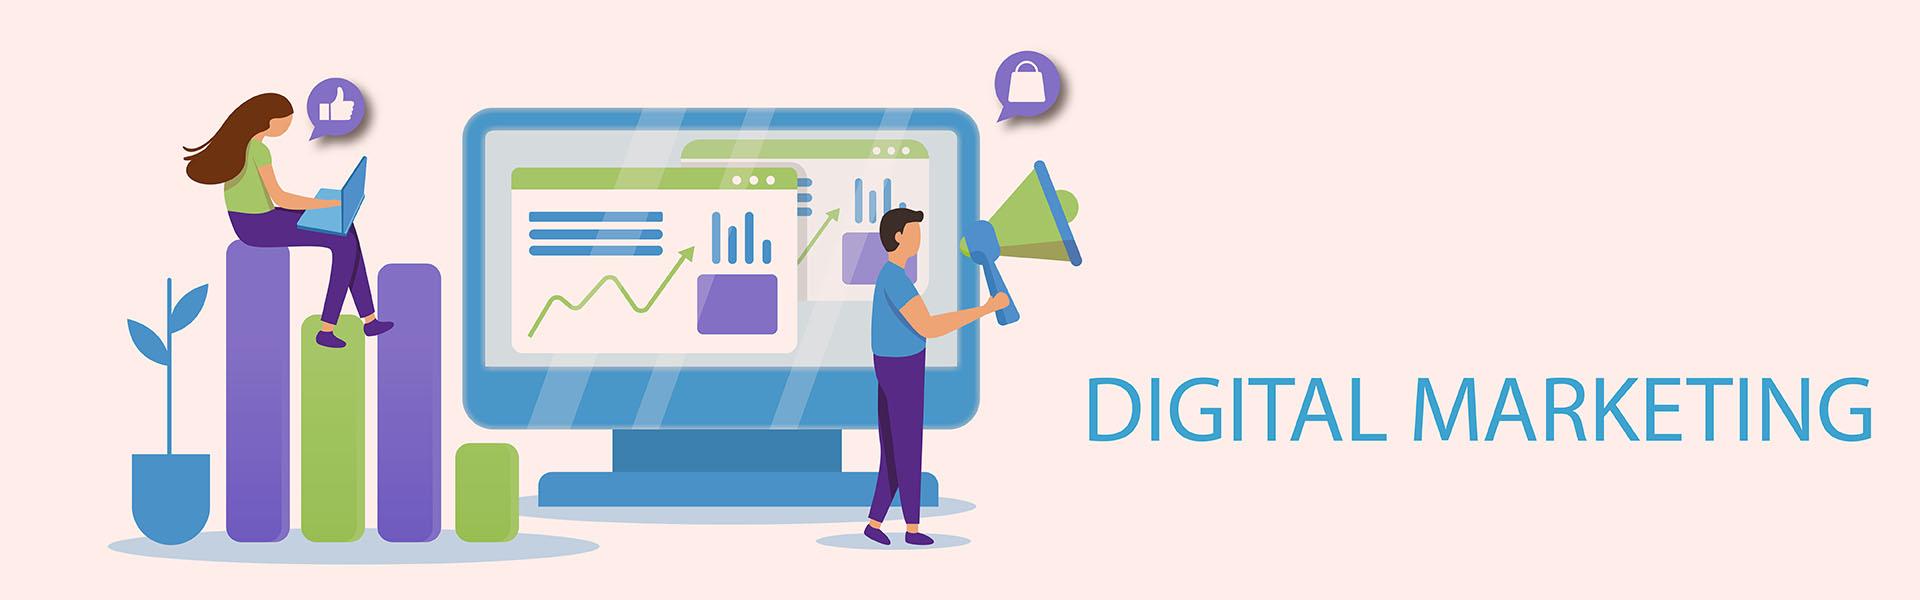 digital_marketing_main_banner